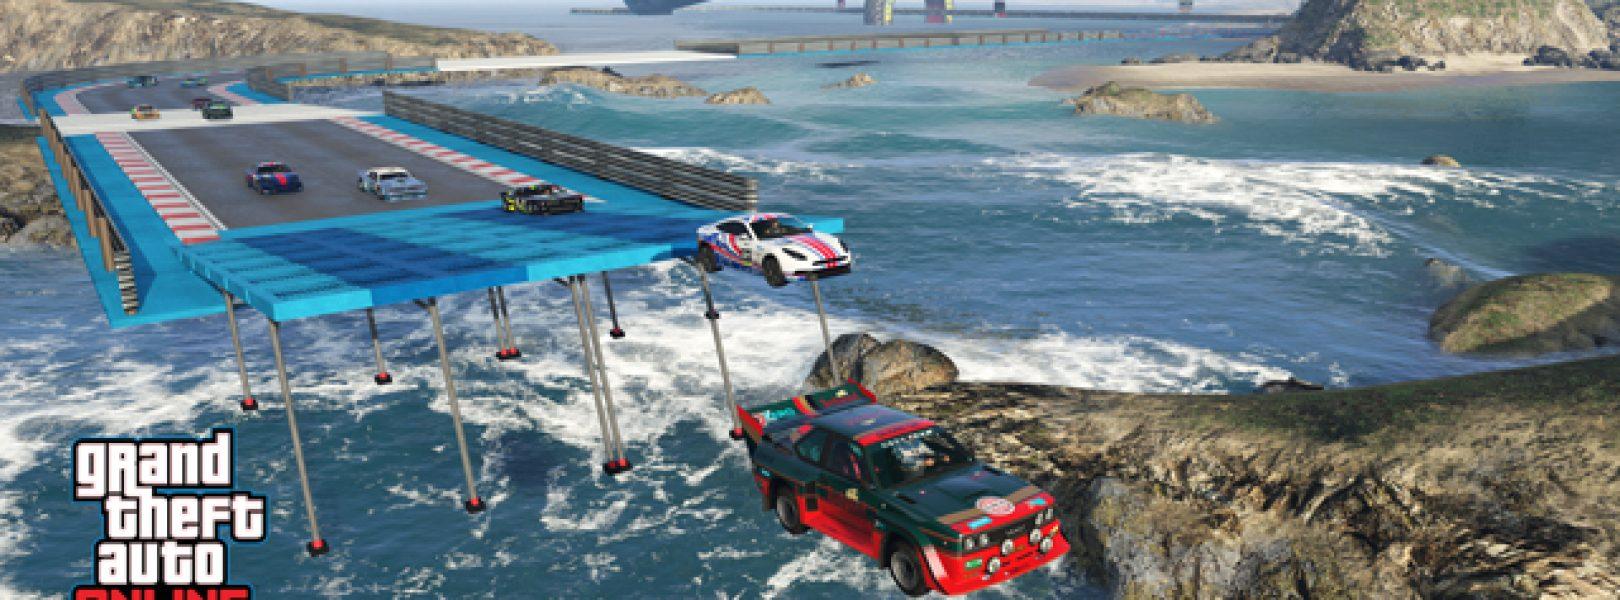 Grand Theft Auto V – Capsule Computers